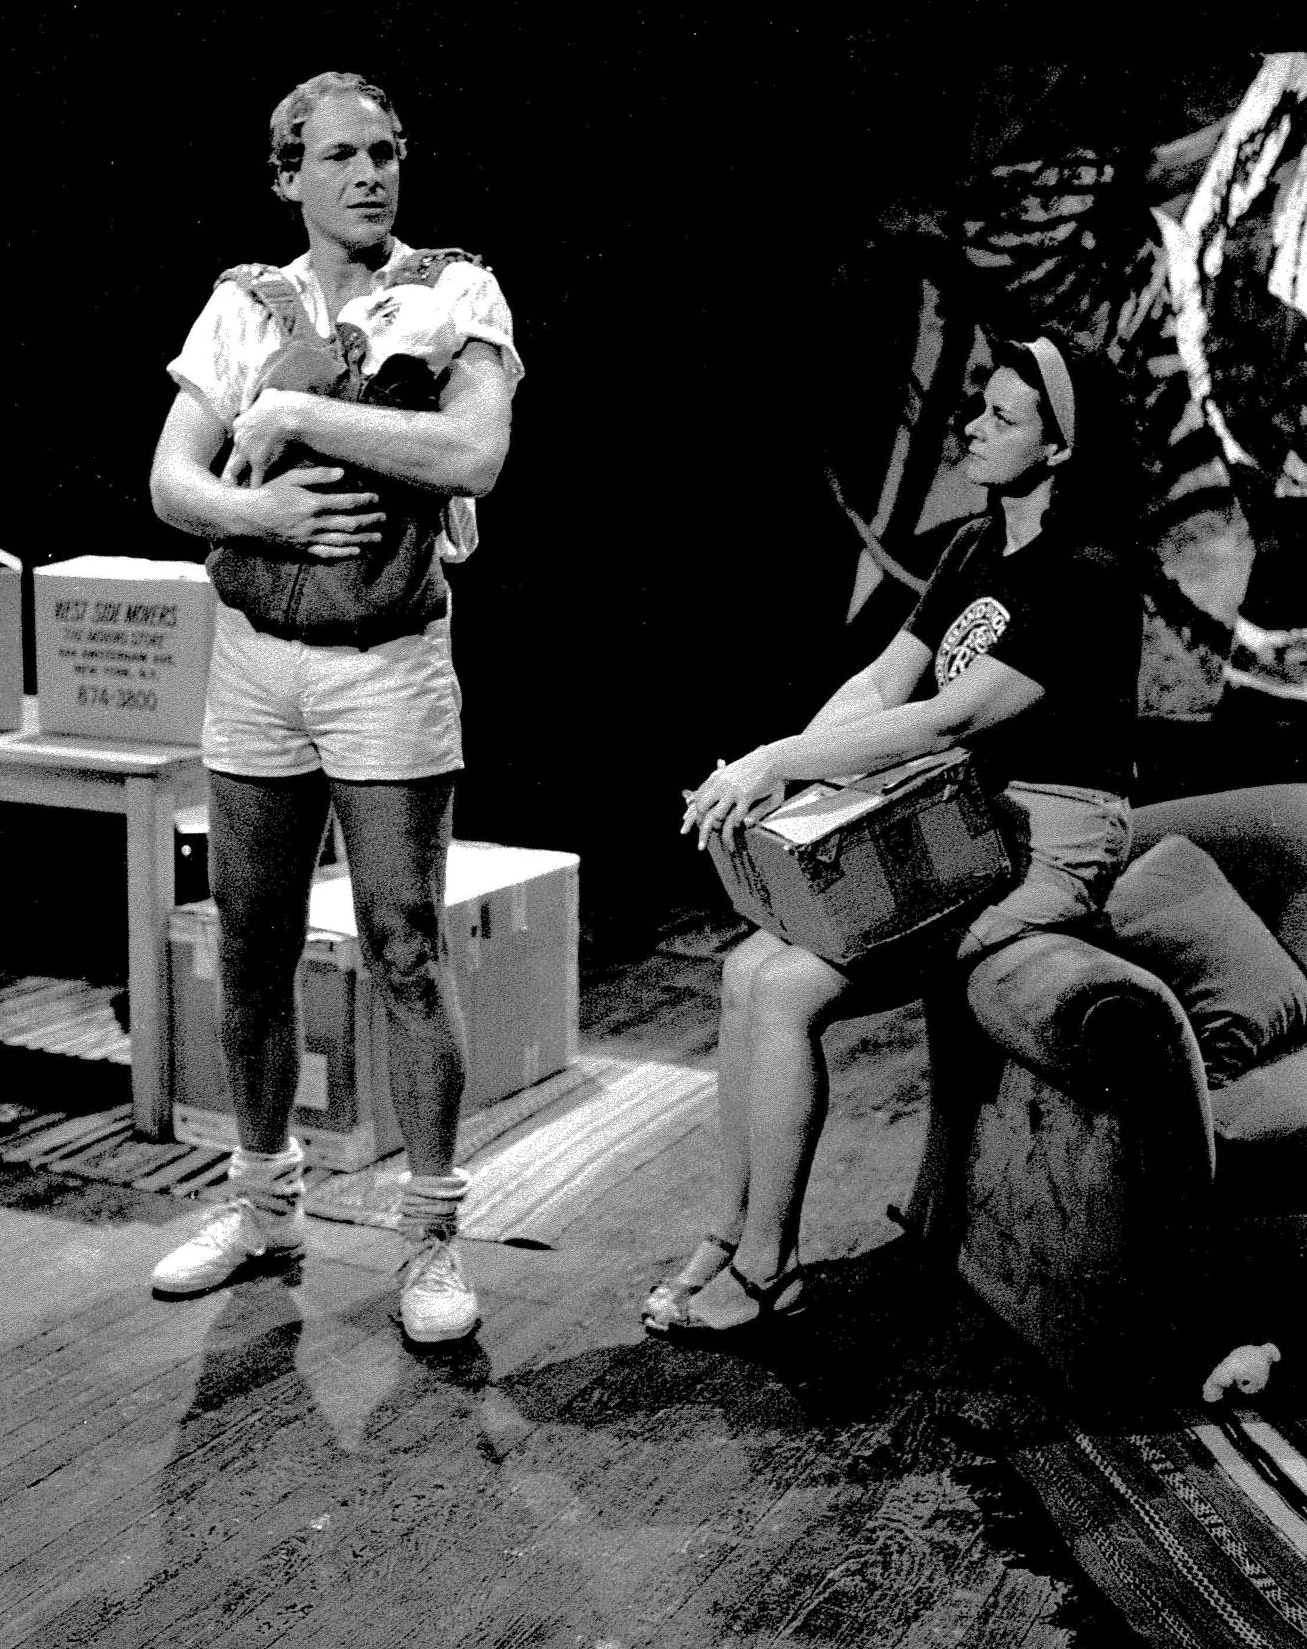 Craig Michael Lewis as Lon, Susan Jones Manino as Sarah